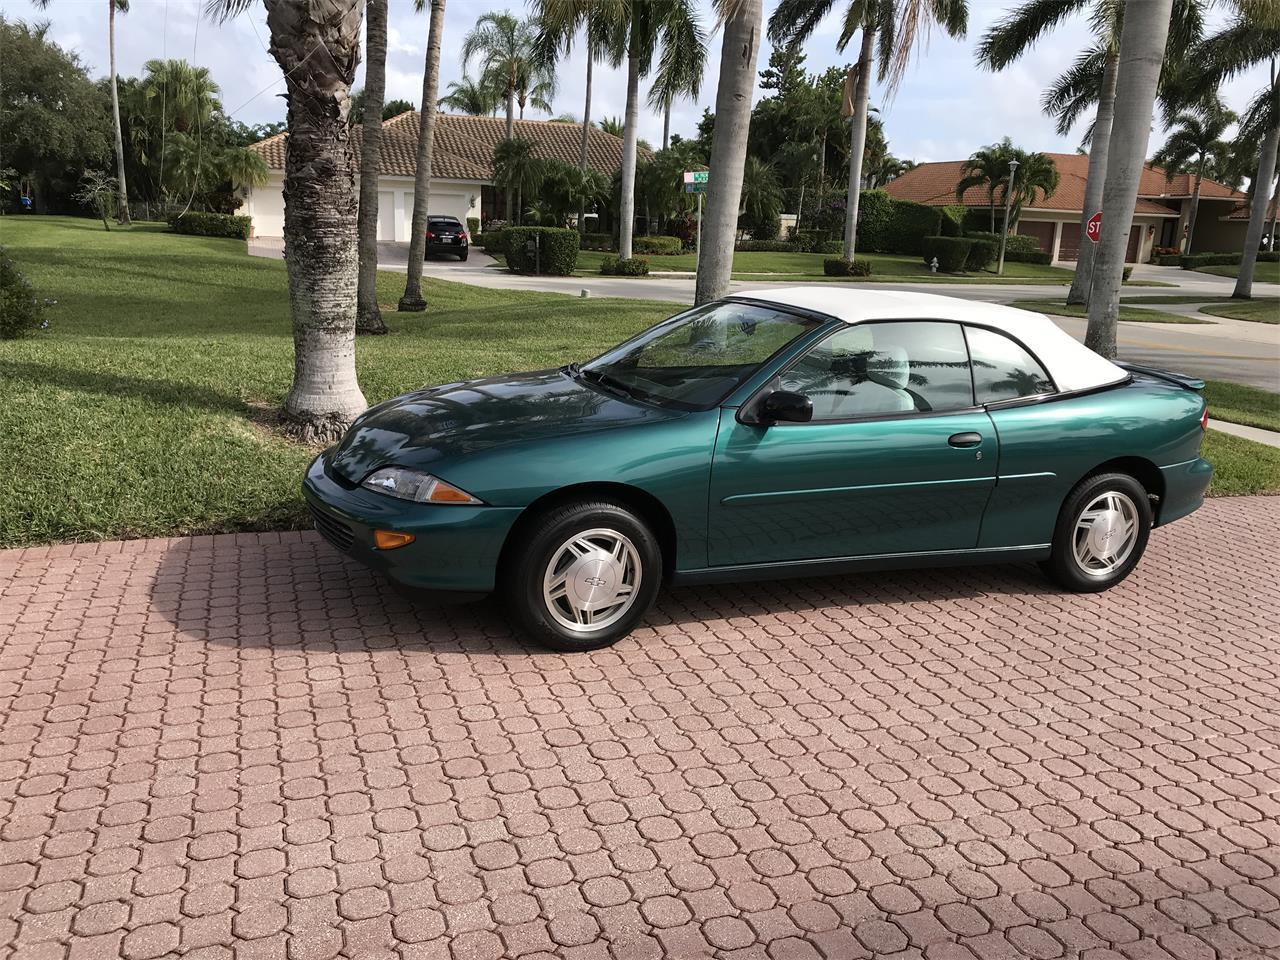 1997 Chevrolet Cavalier (CC-1186296) for sale in Boca Raton, Florida